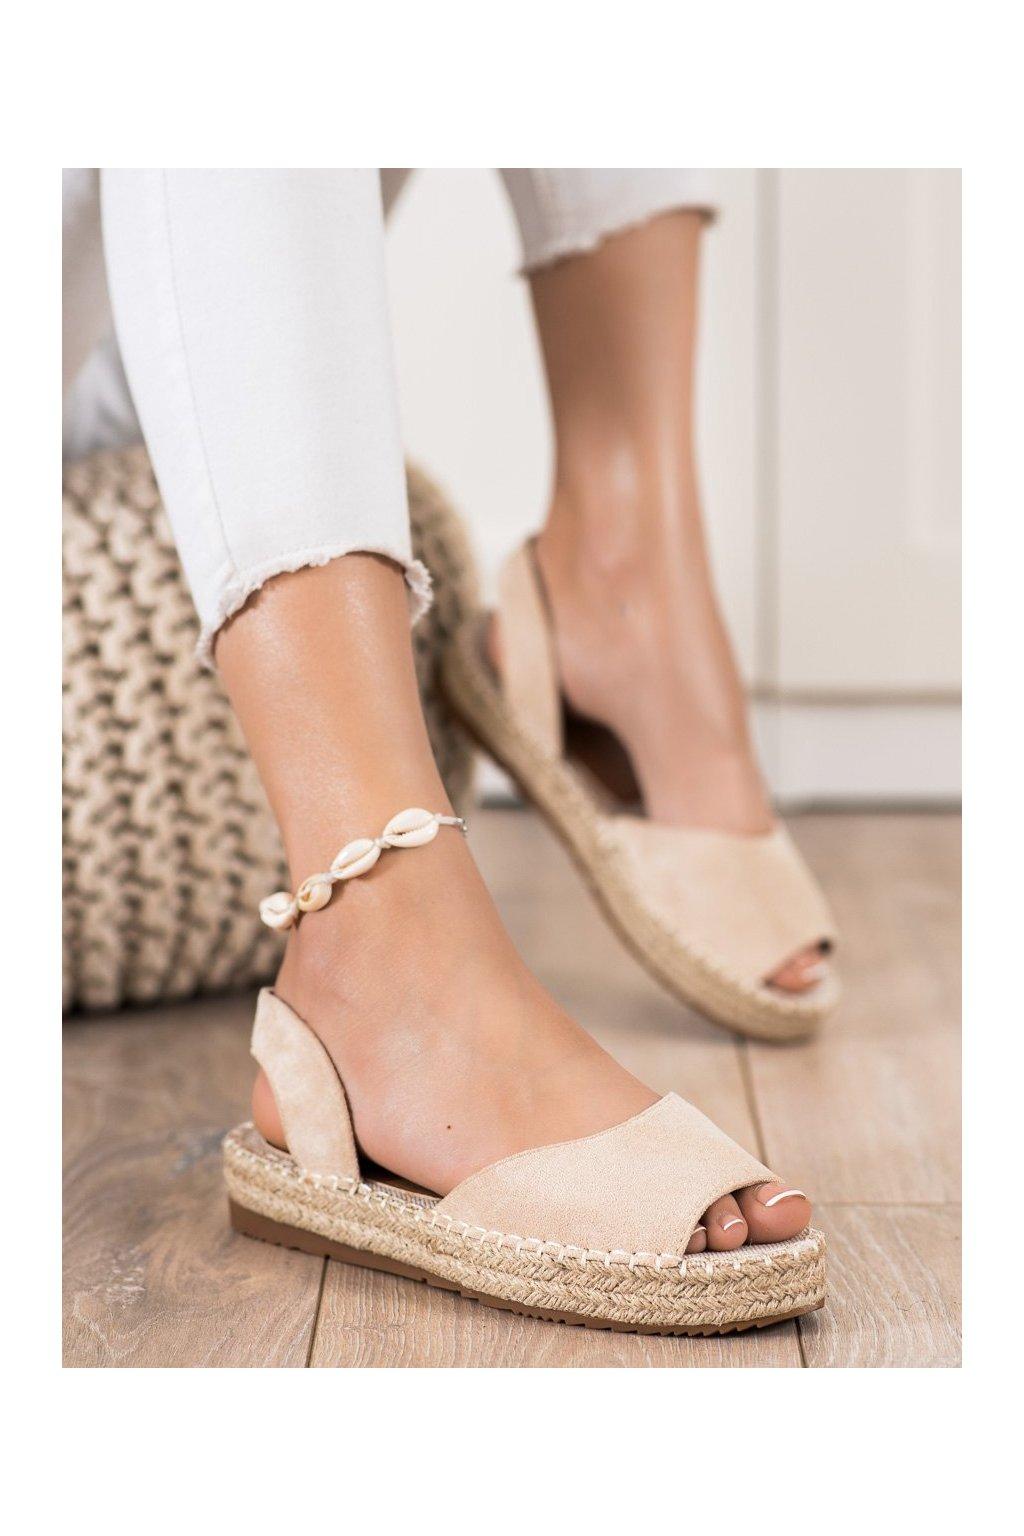 Hnedé sandále Ideal shoes kod 6915BE